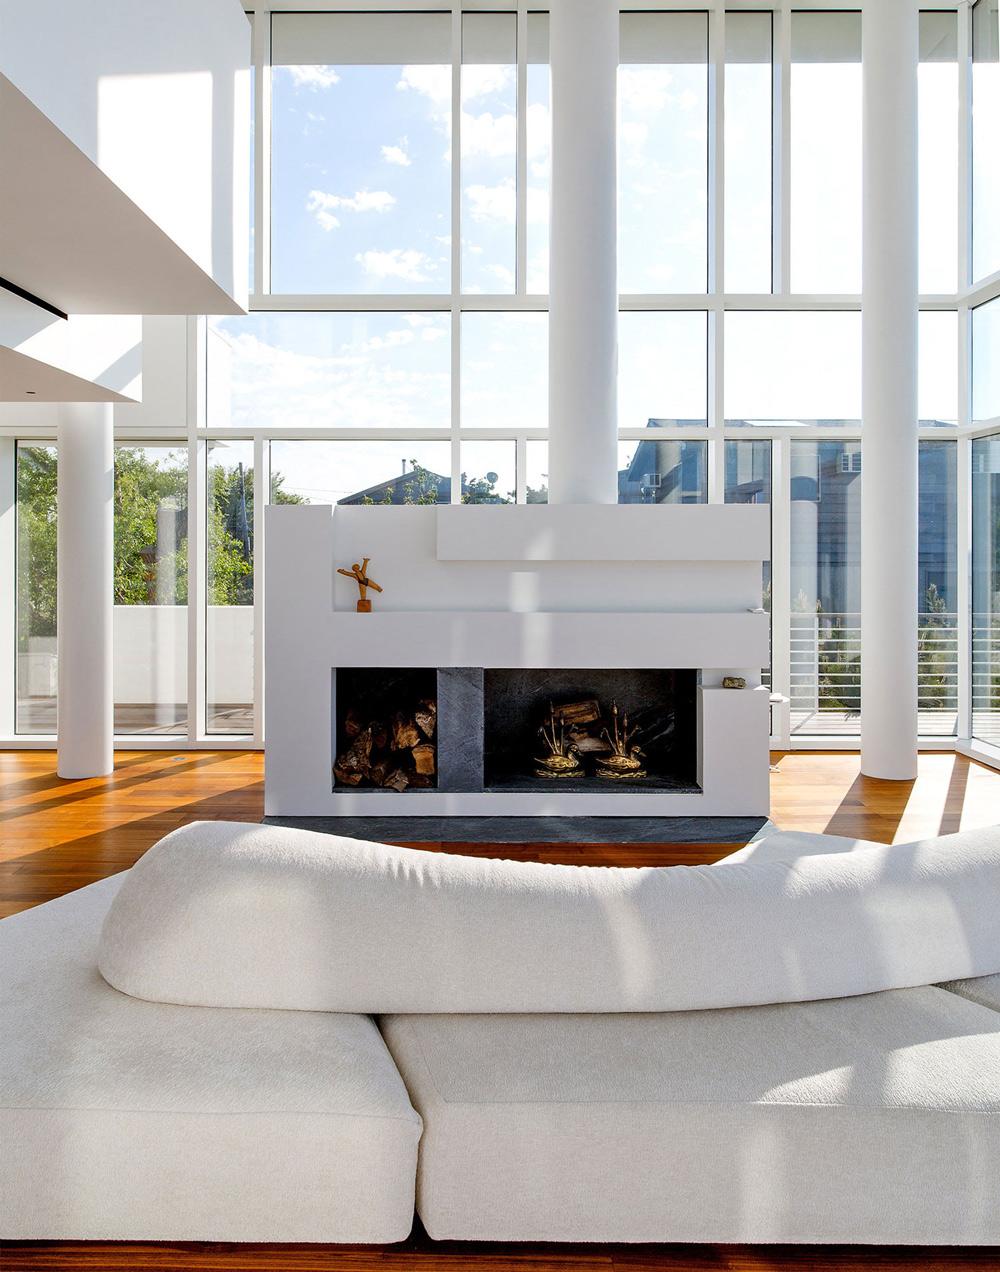 Fire Island House By Richard Meier